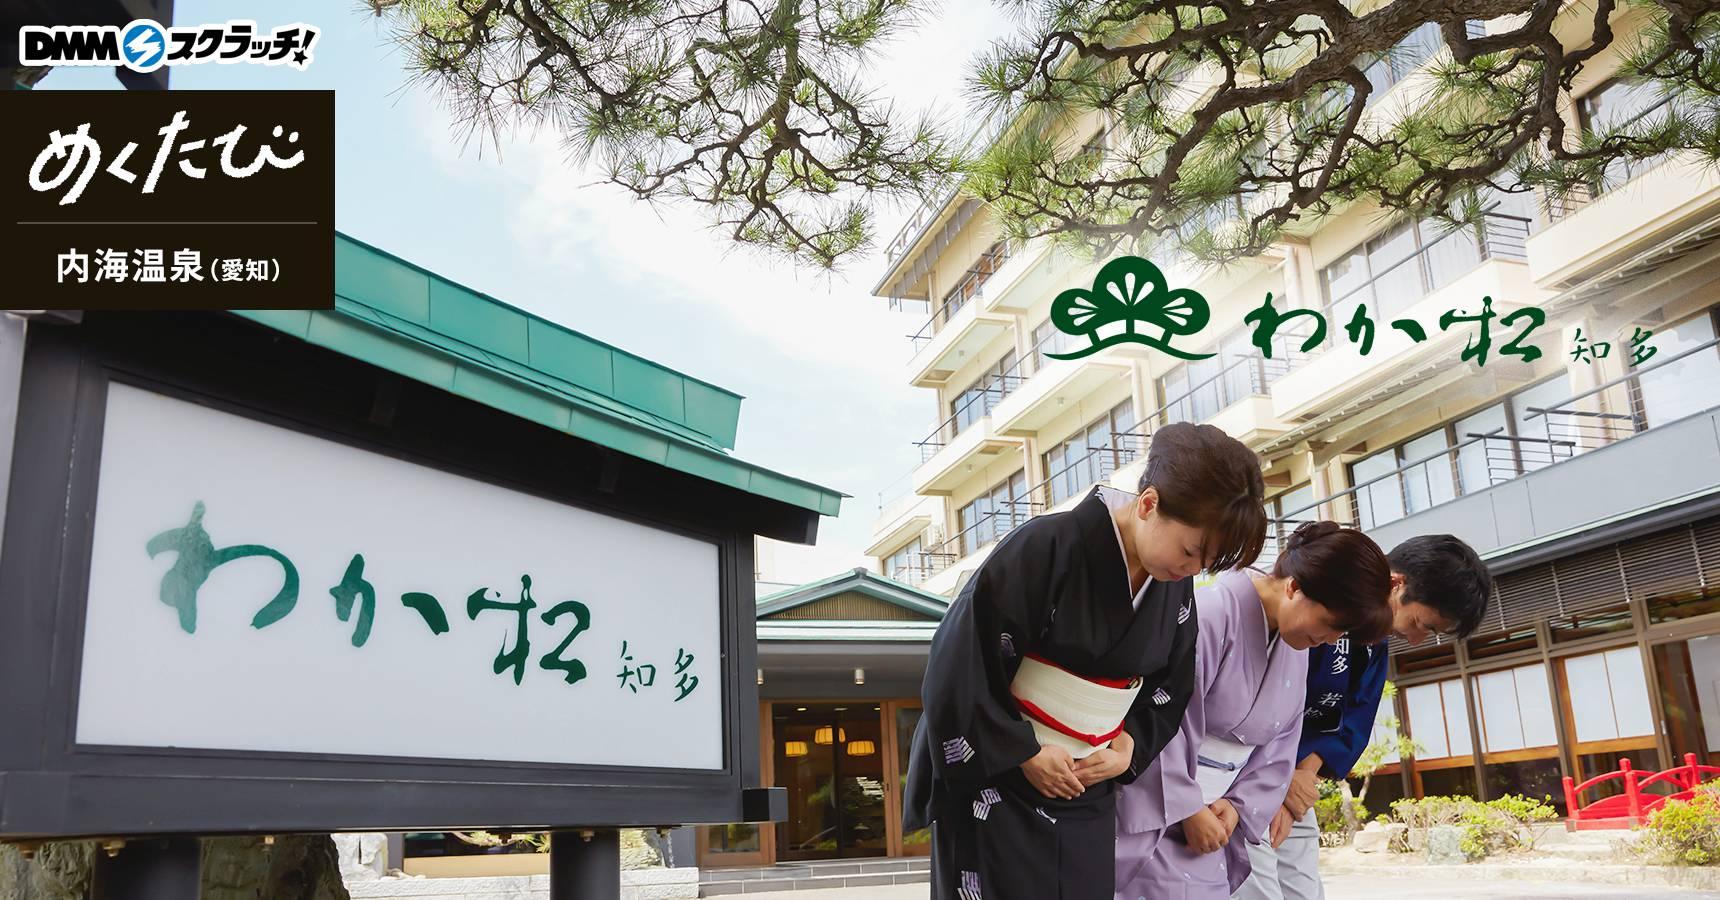 わか松知多 内海温泉 (愛知県)